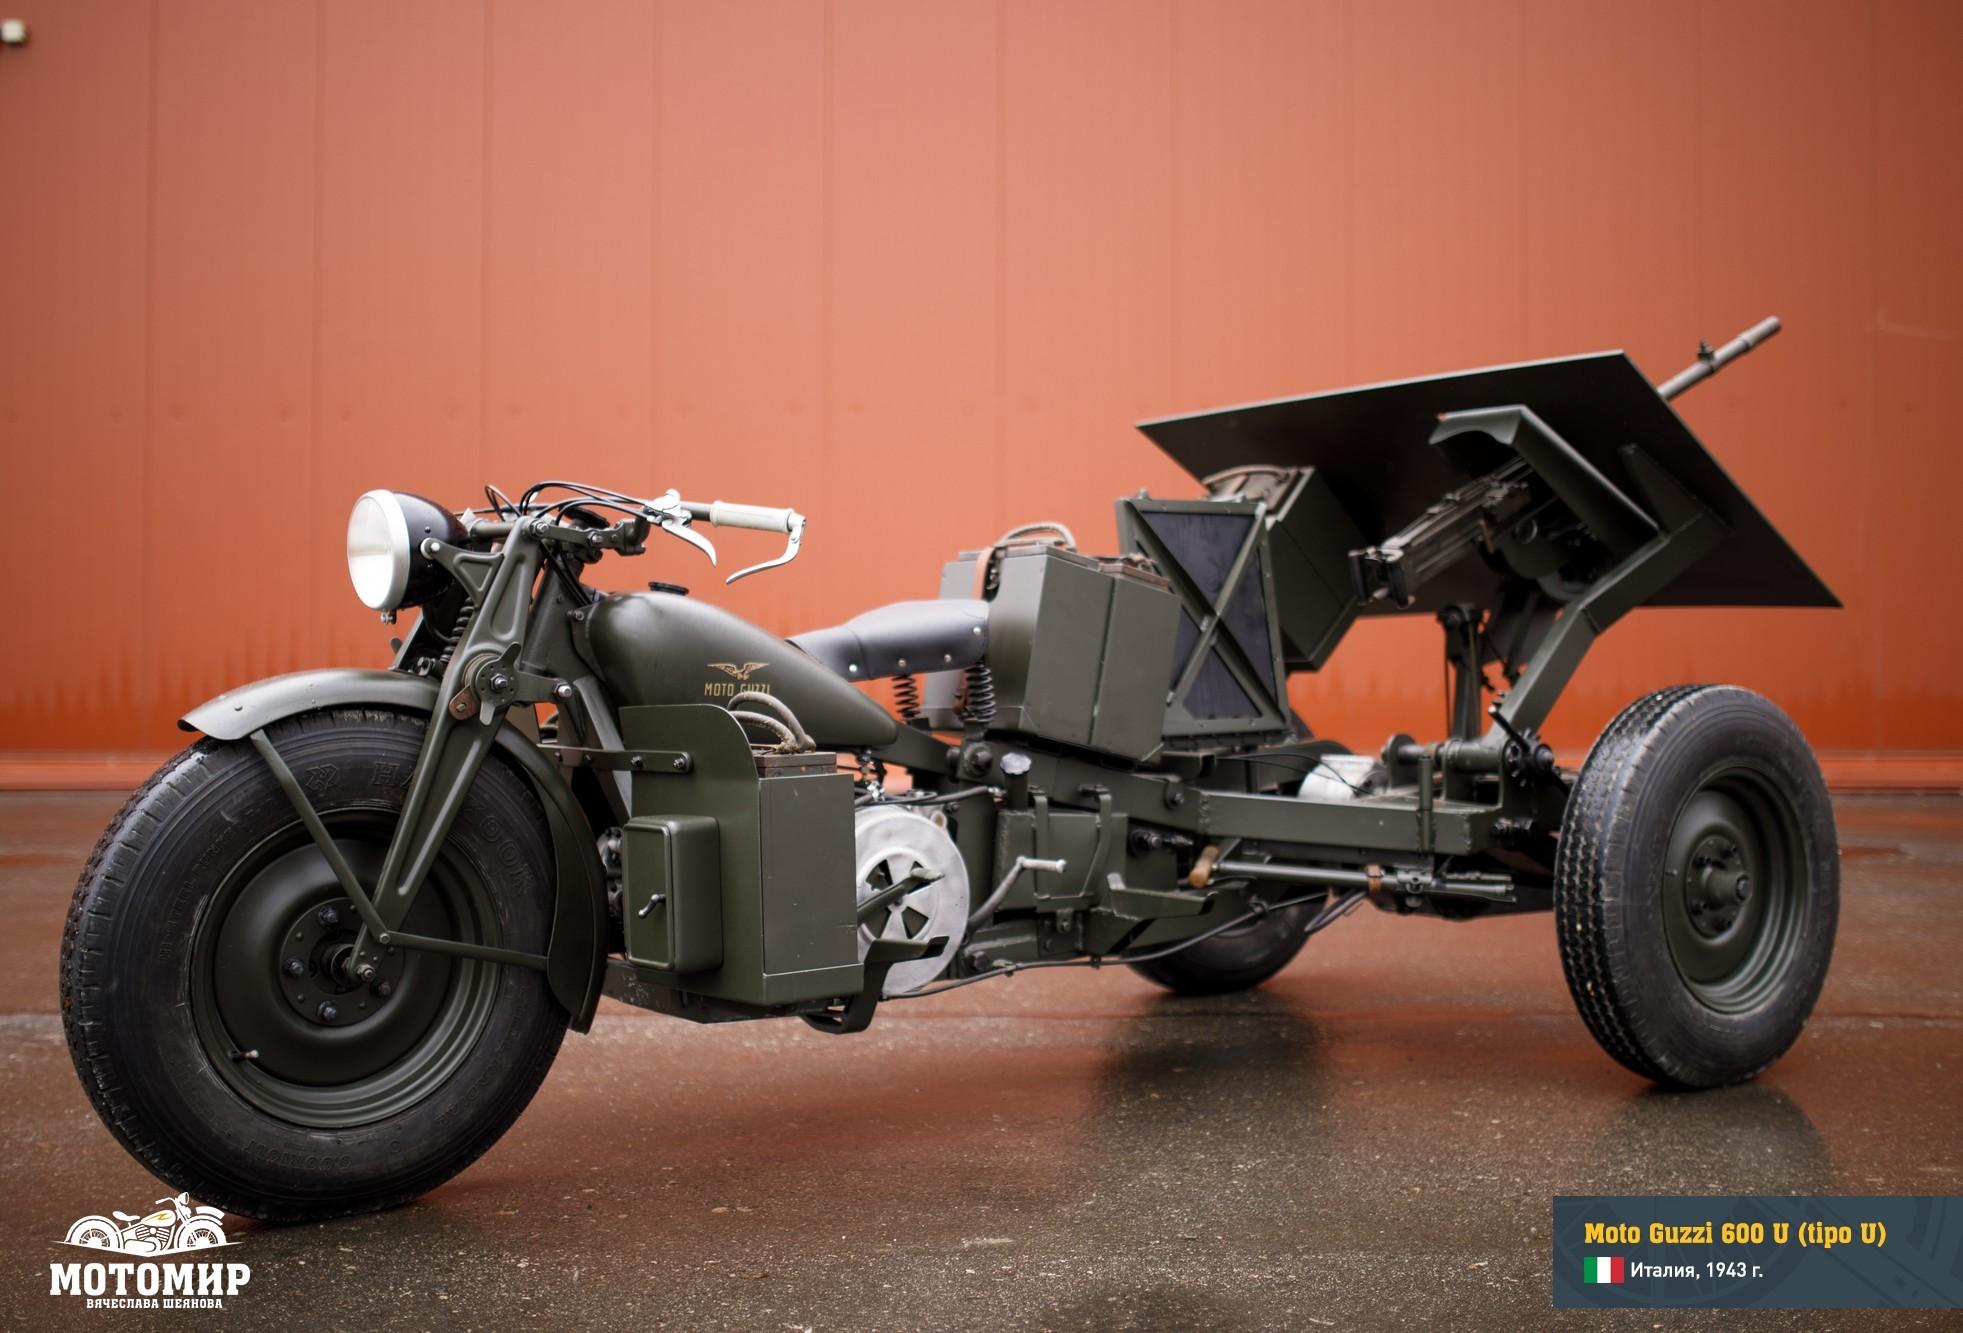 moto-guzzi-600-u-web-37